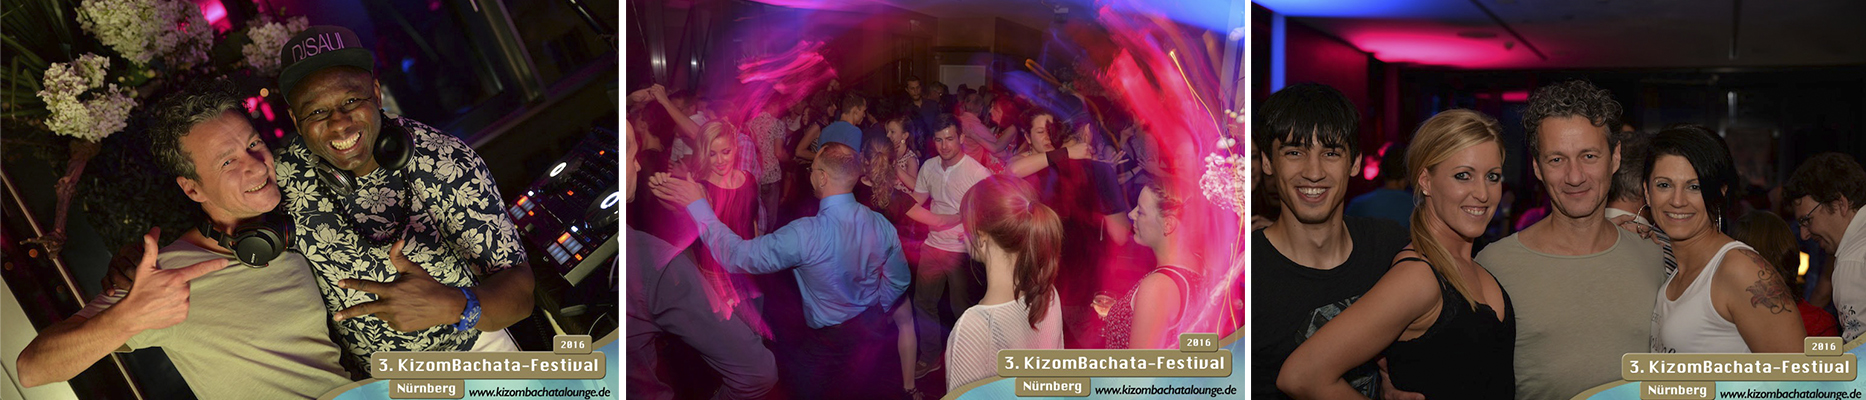 KizomBachata_Festival_Fuerth_Nuernberg_1